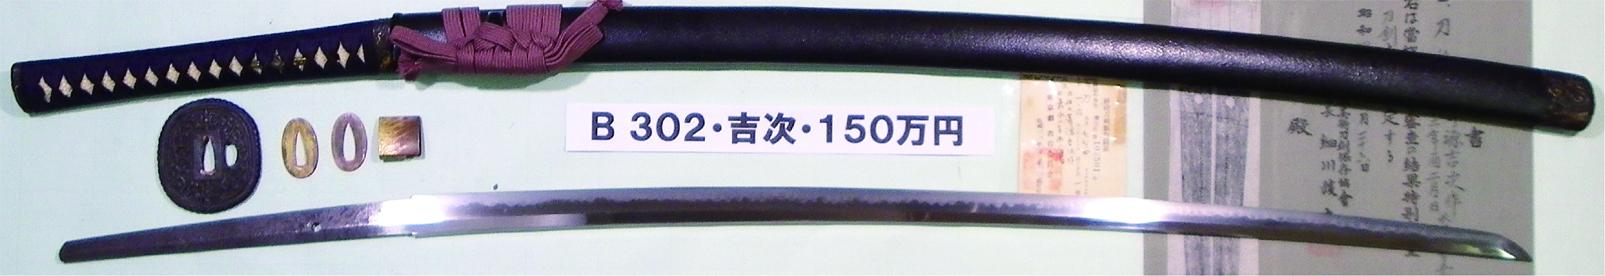 B2302